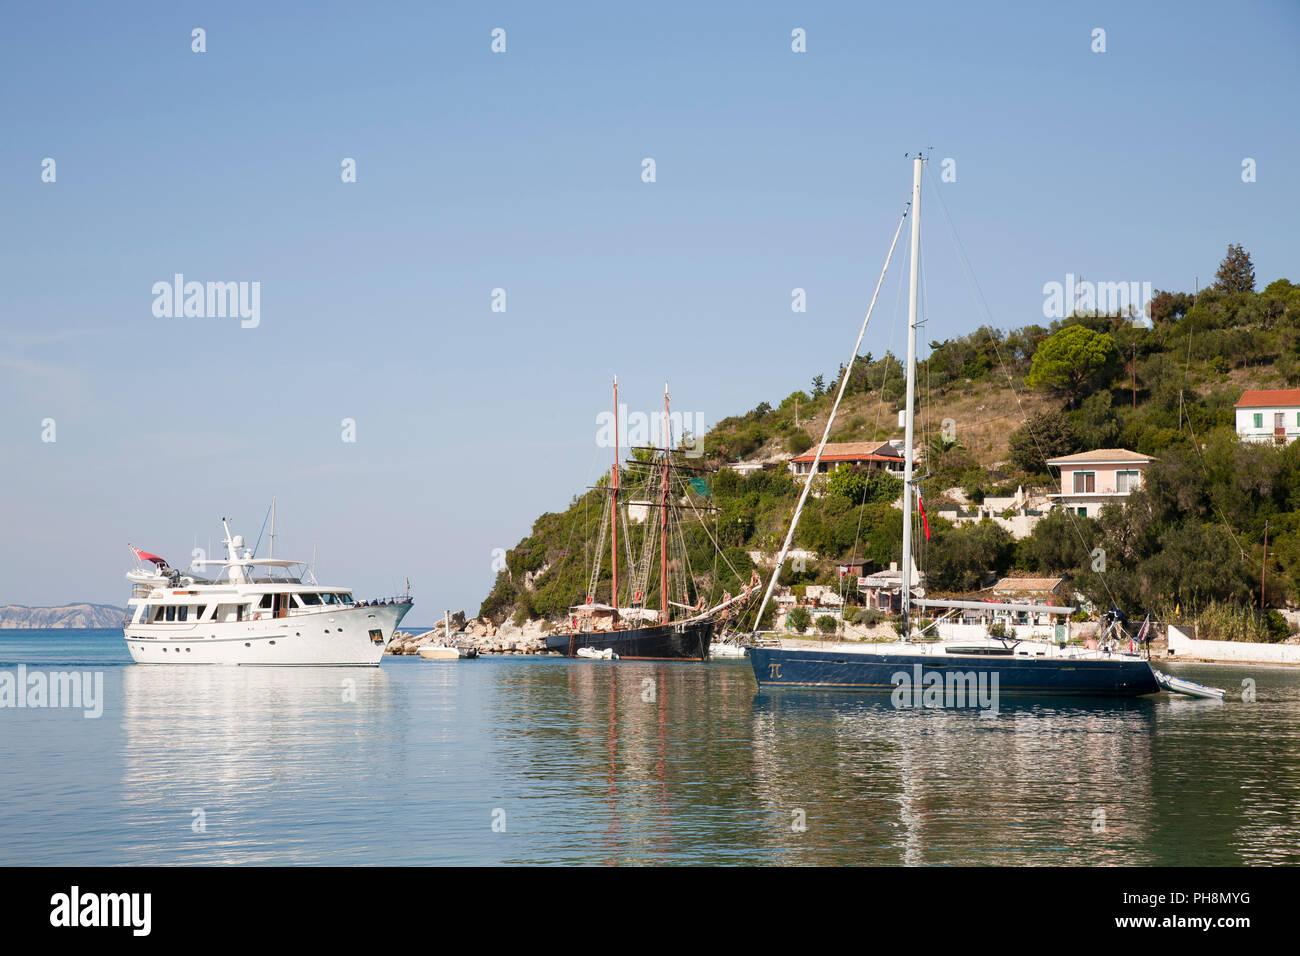 Lakka village, Ionian Islands, Paxi island, Greece, Europe - Stock Image